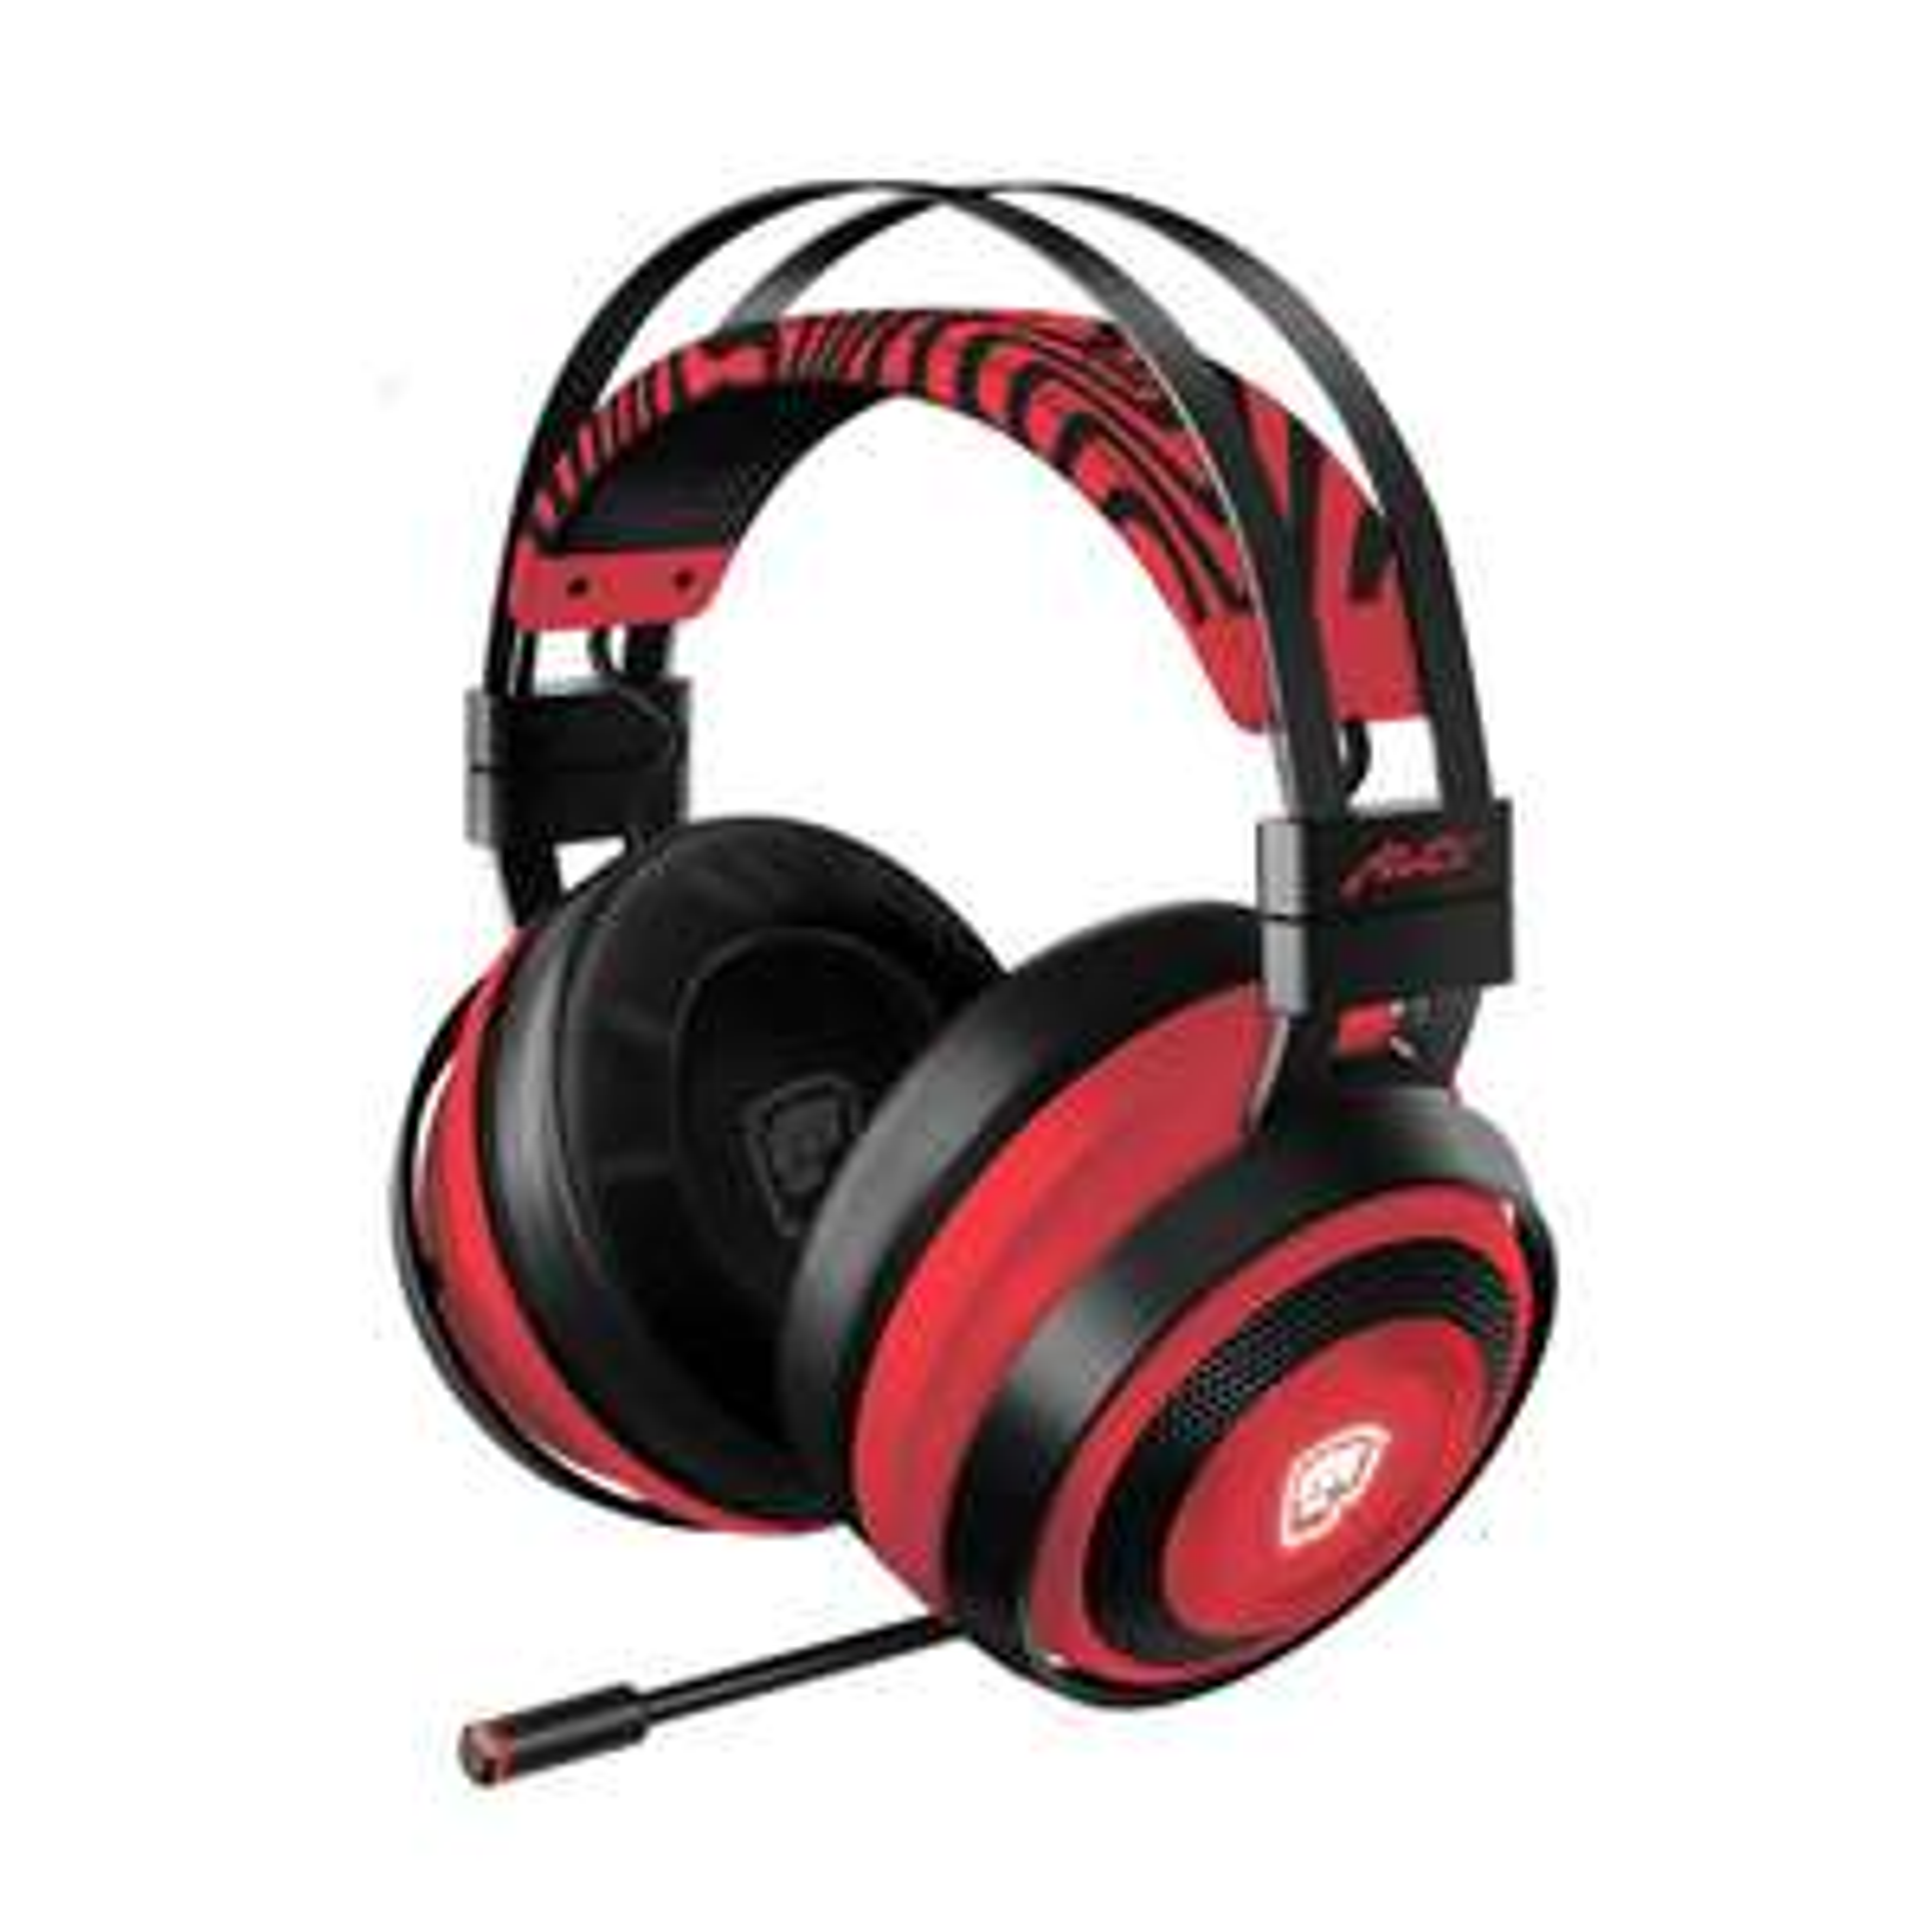 Razer Nari Ultimate draadloze gaming headset PewDiePie edition